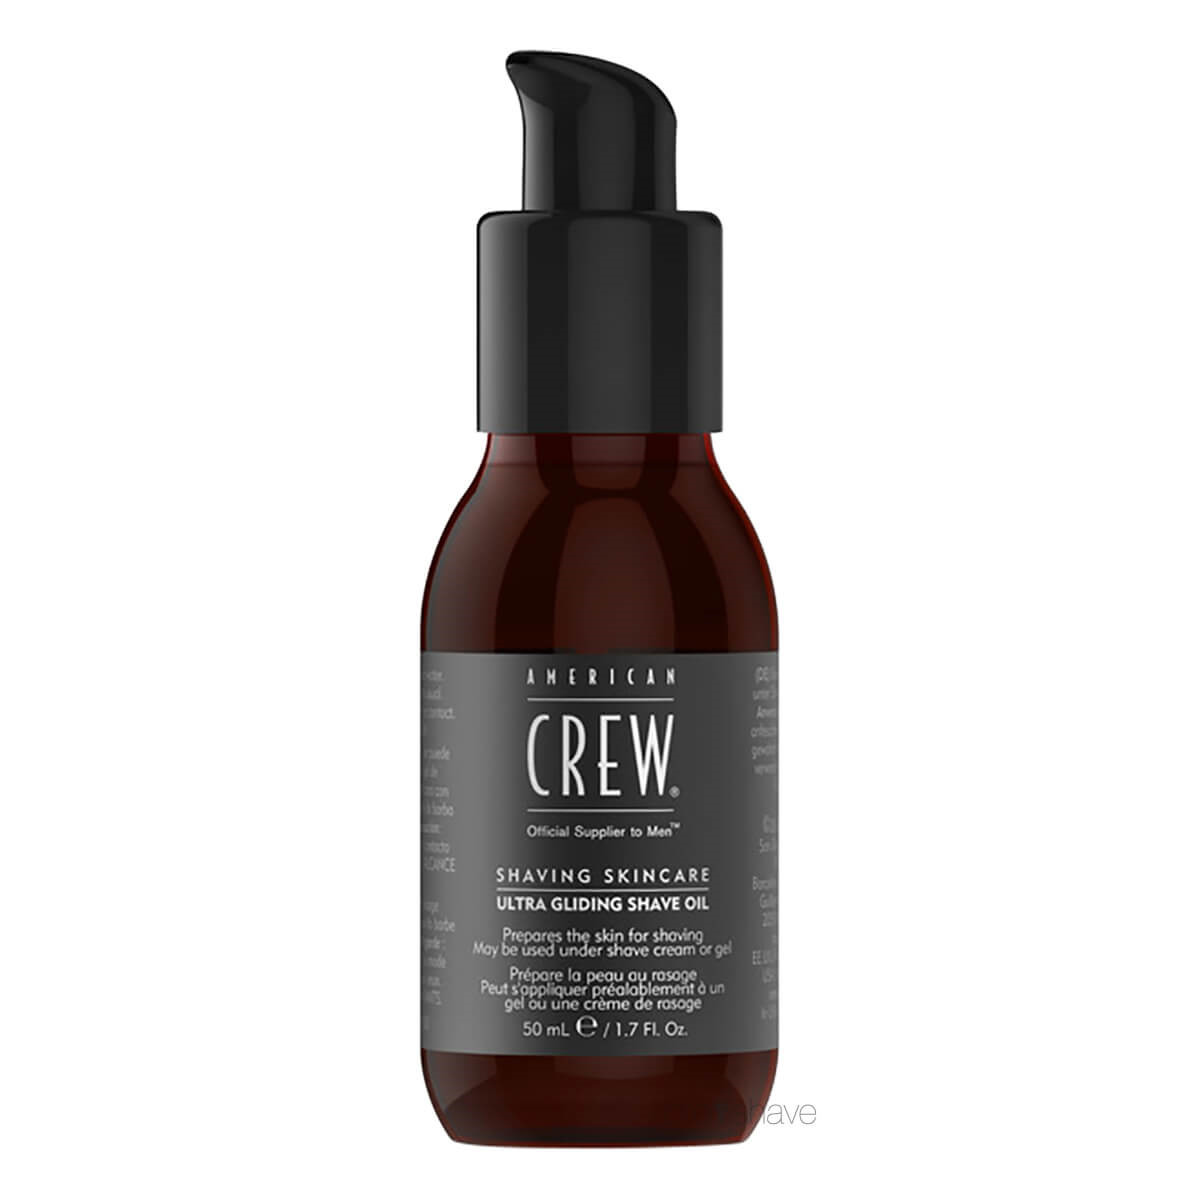 American Crew Shaving Skincare Ultra Gliding Shave Oil, 50 ml.